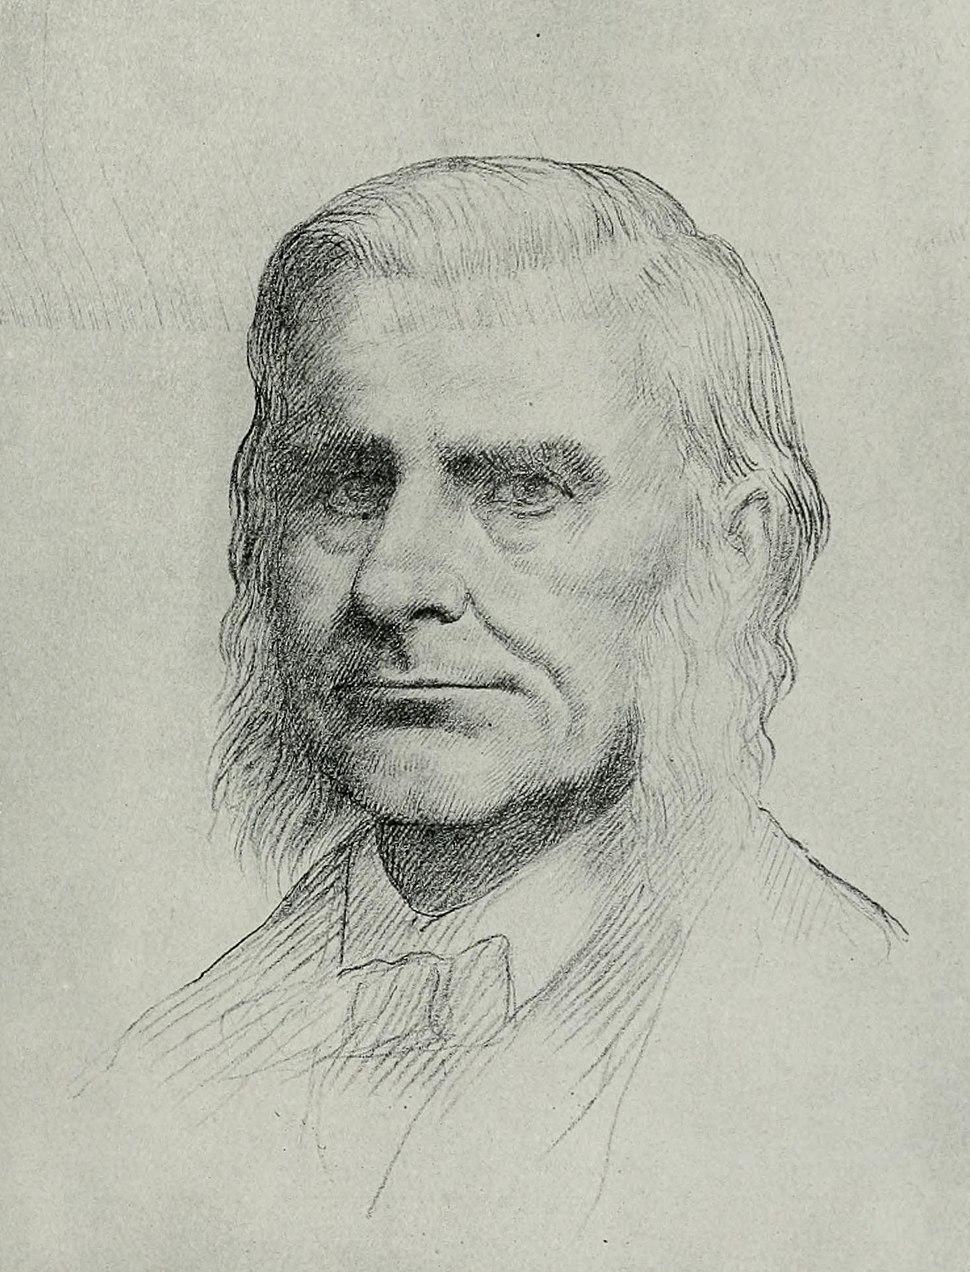 Drawing of Thomas Henry Huxley